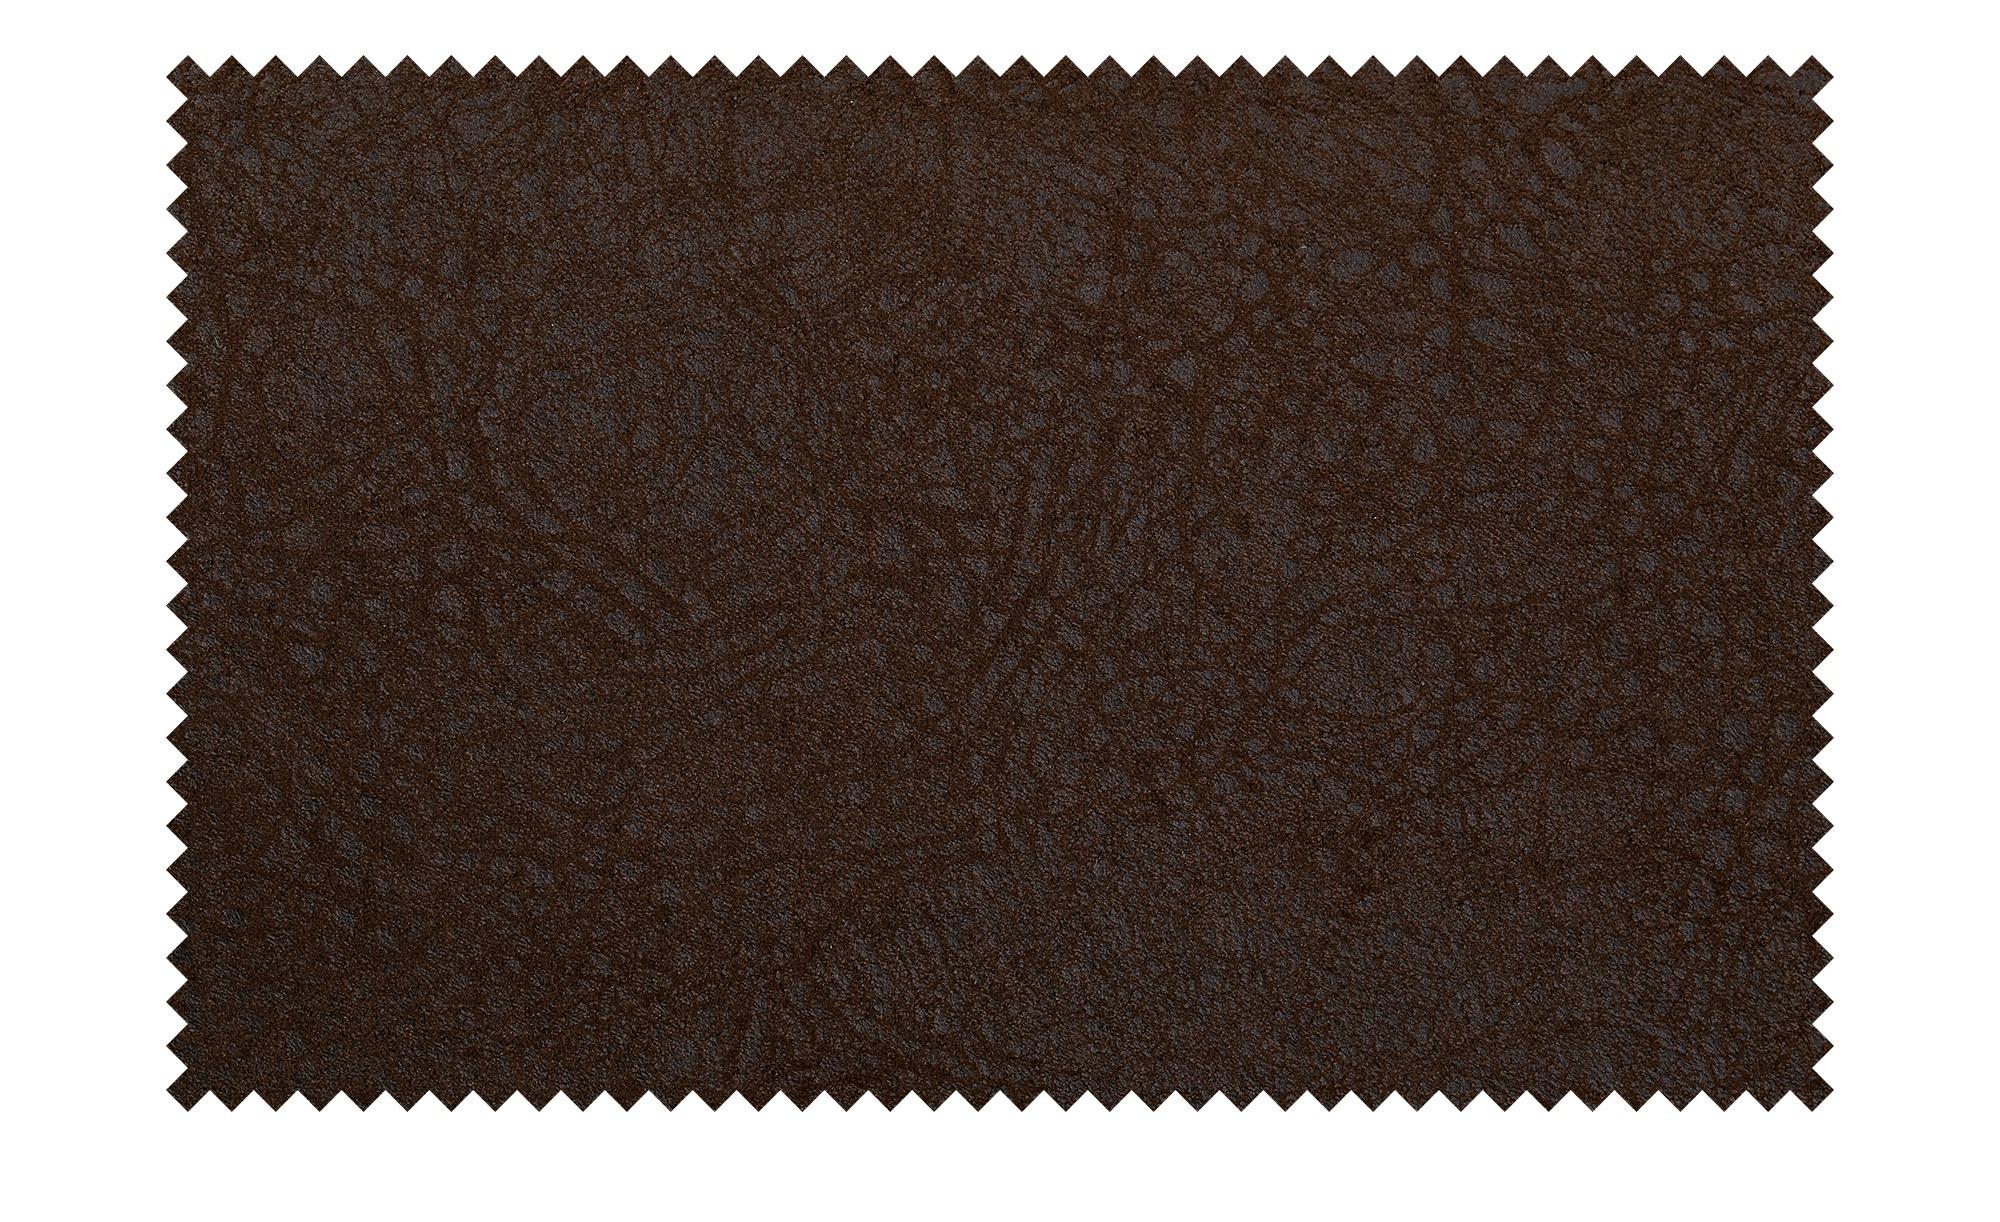 switch Sessel  Teddy ¦ braun ¦ Maße (cm): B: 87 H: 82 T: 83 Polstermöbel > Sessel > Polstersessel - Höffner